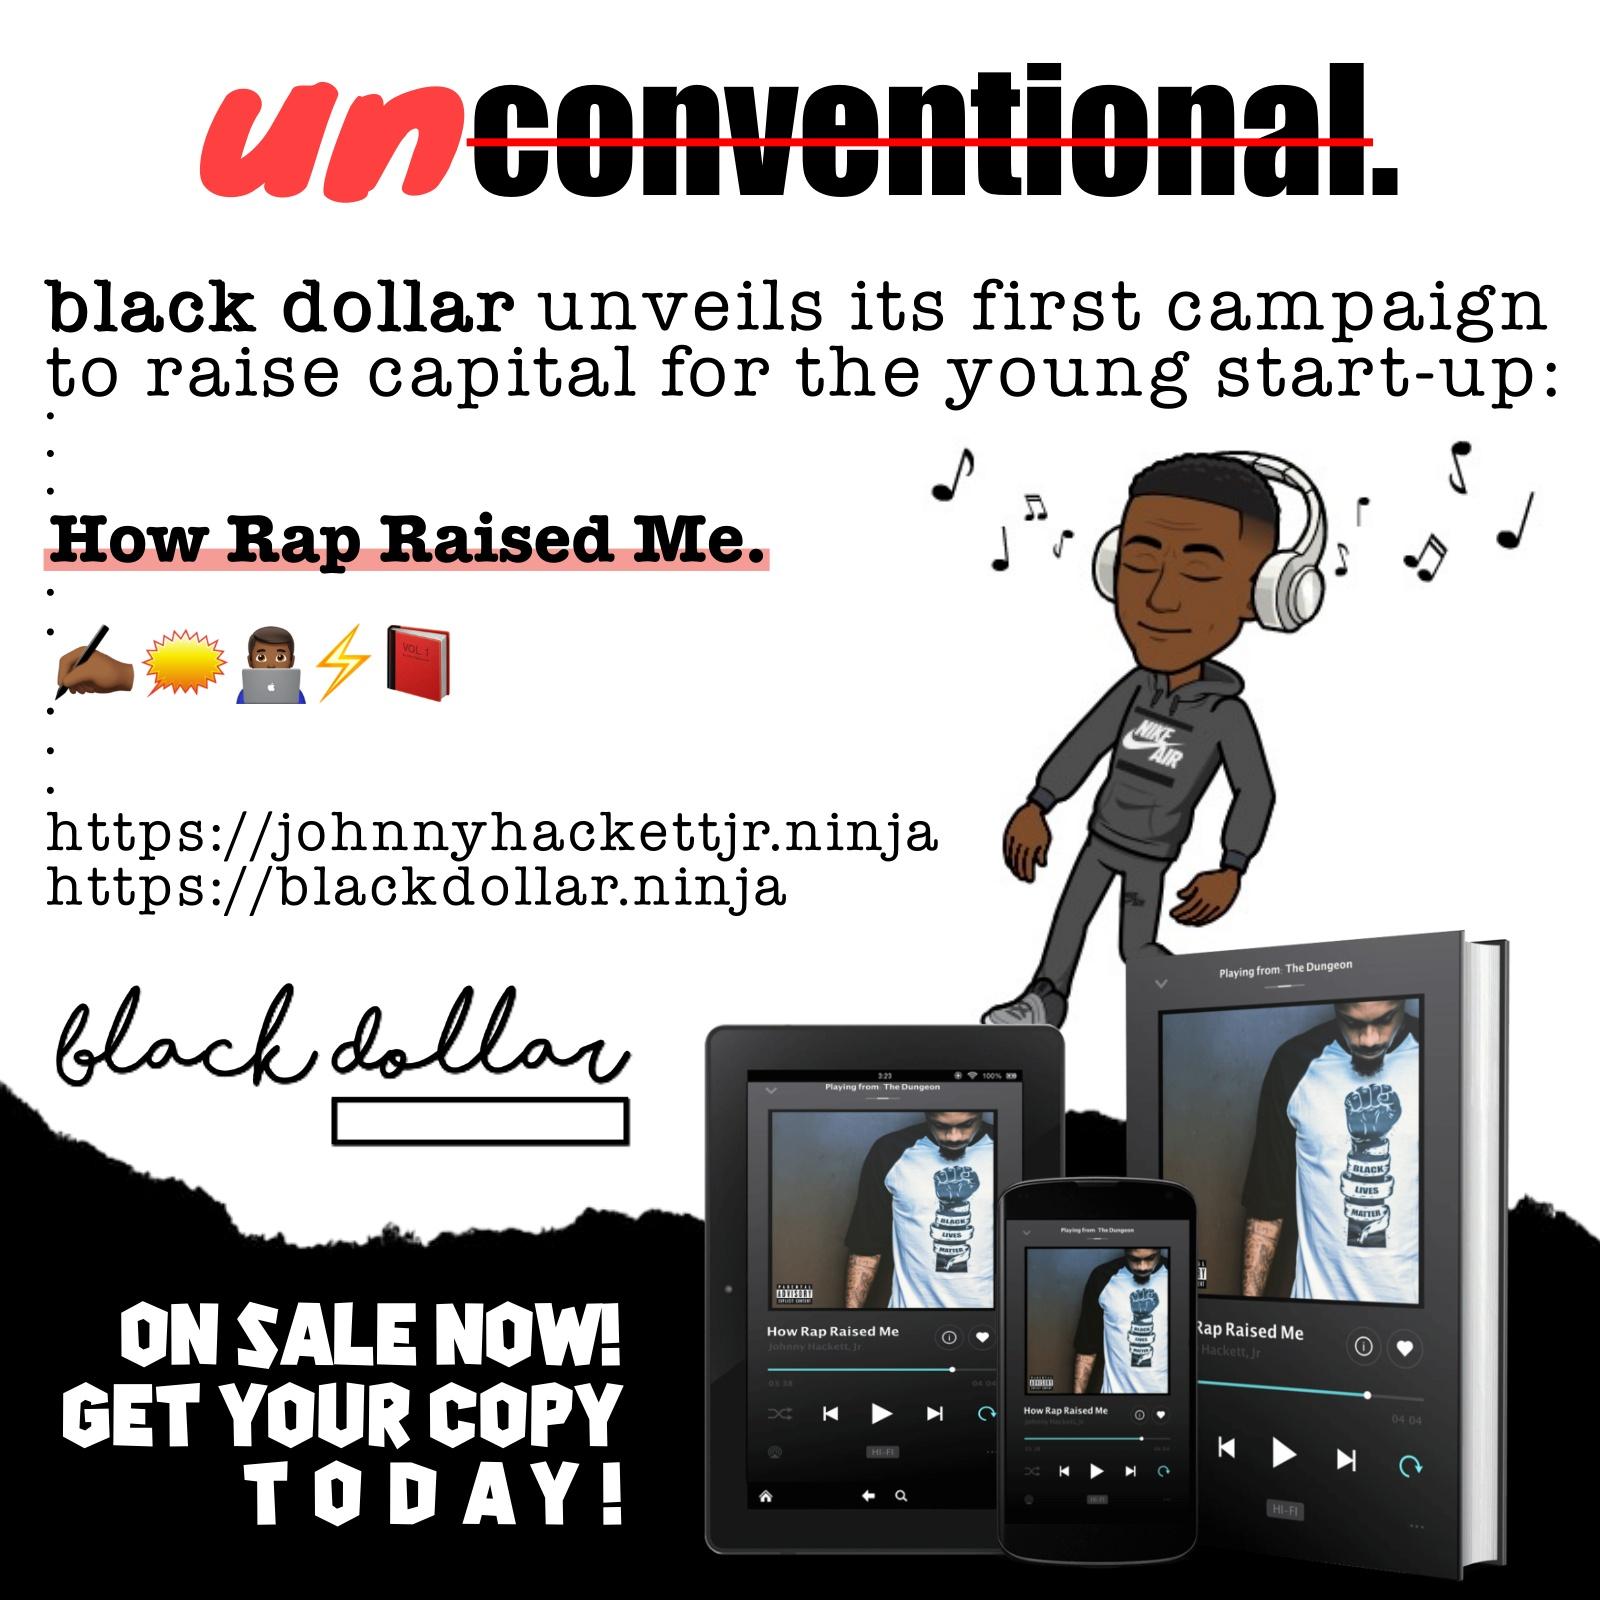 hrrm on sale flyer.jpg